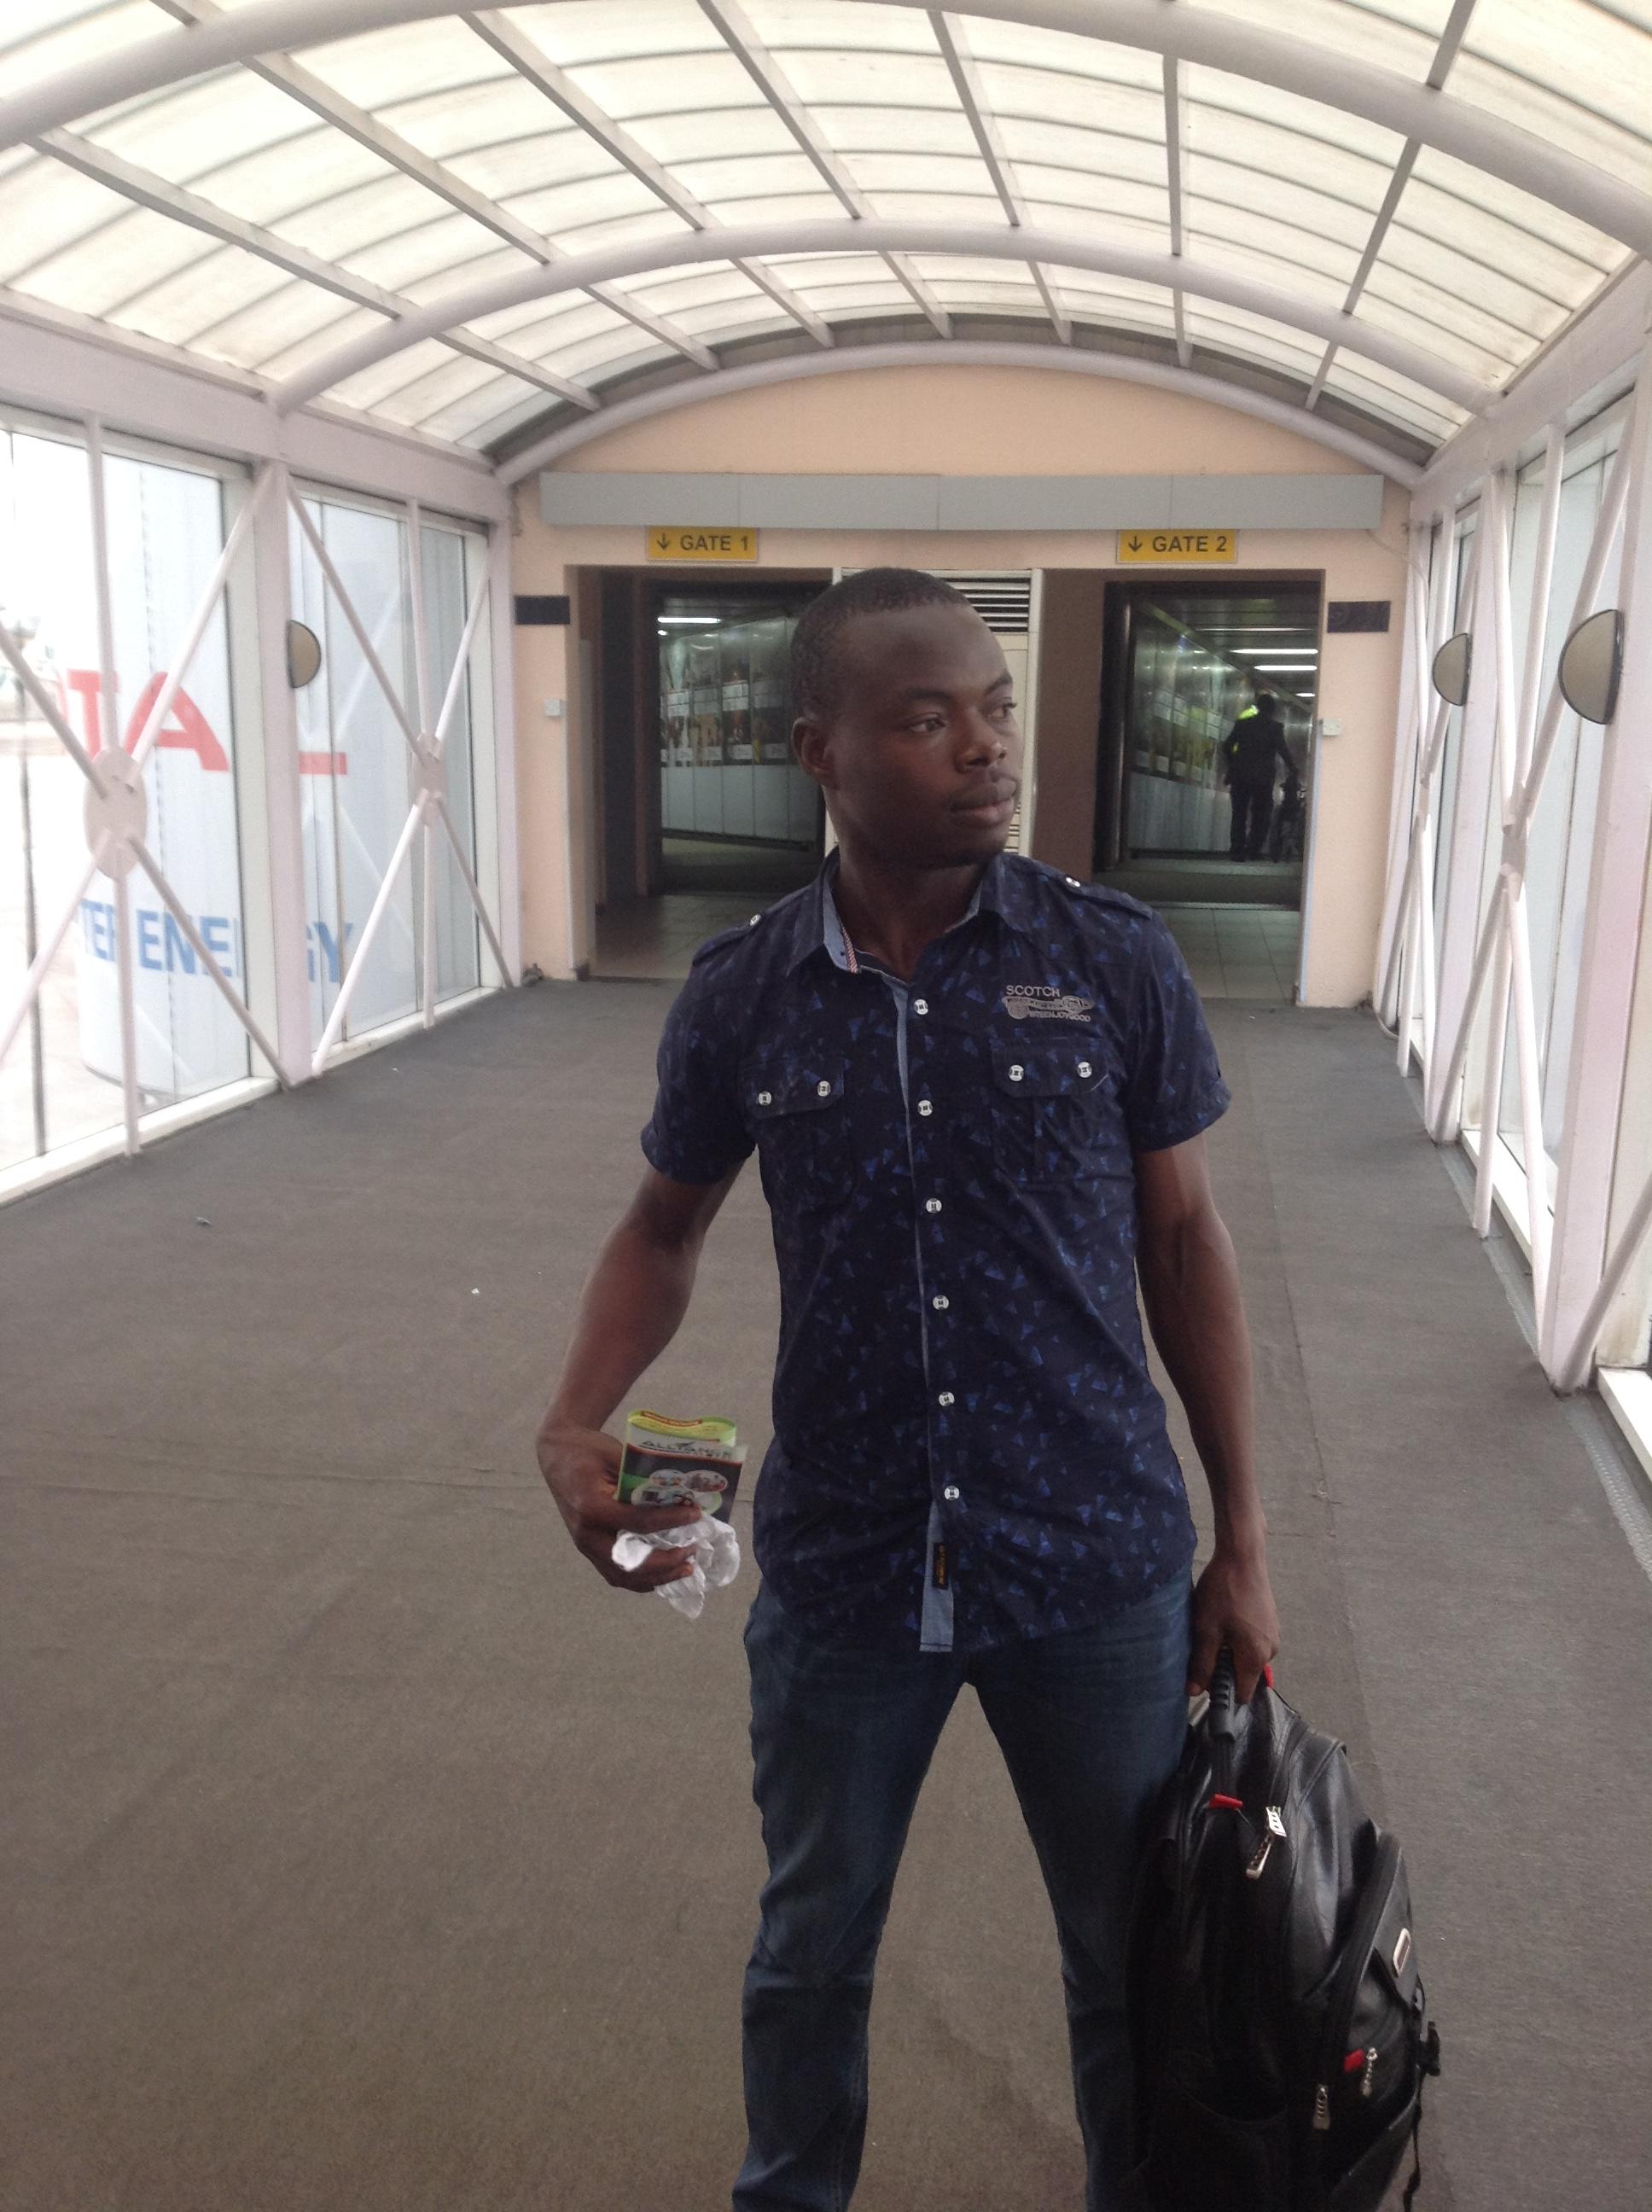 Olawale Daniel coming off the plane